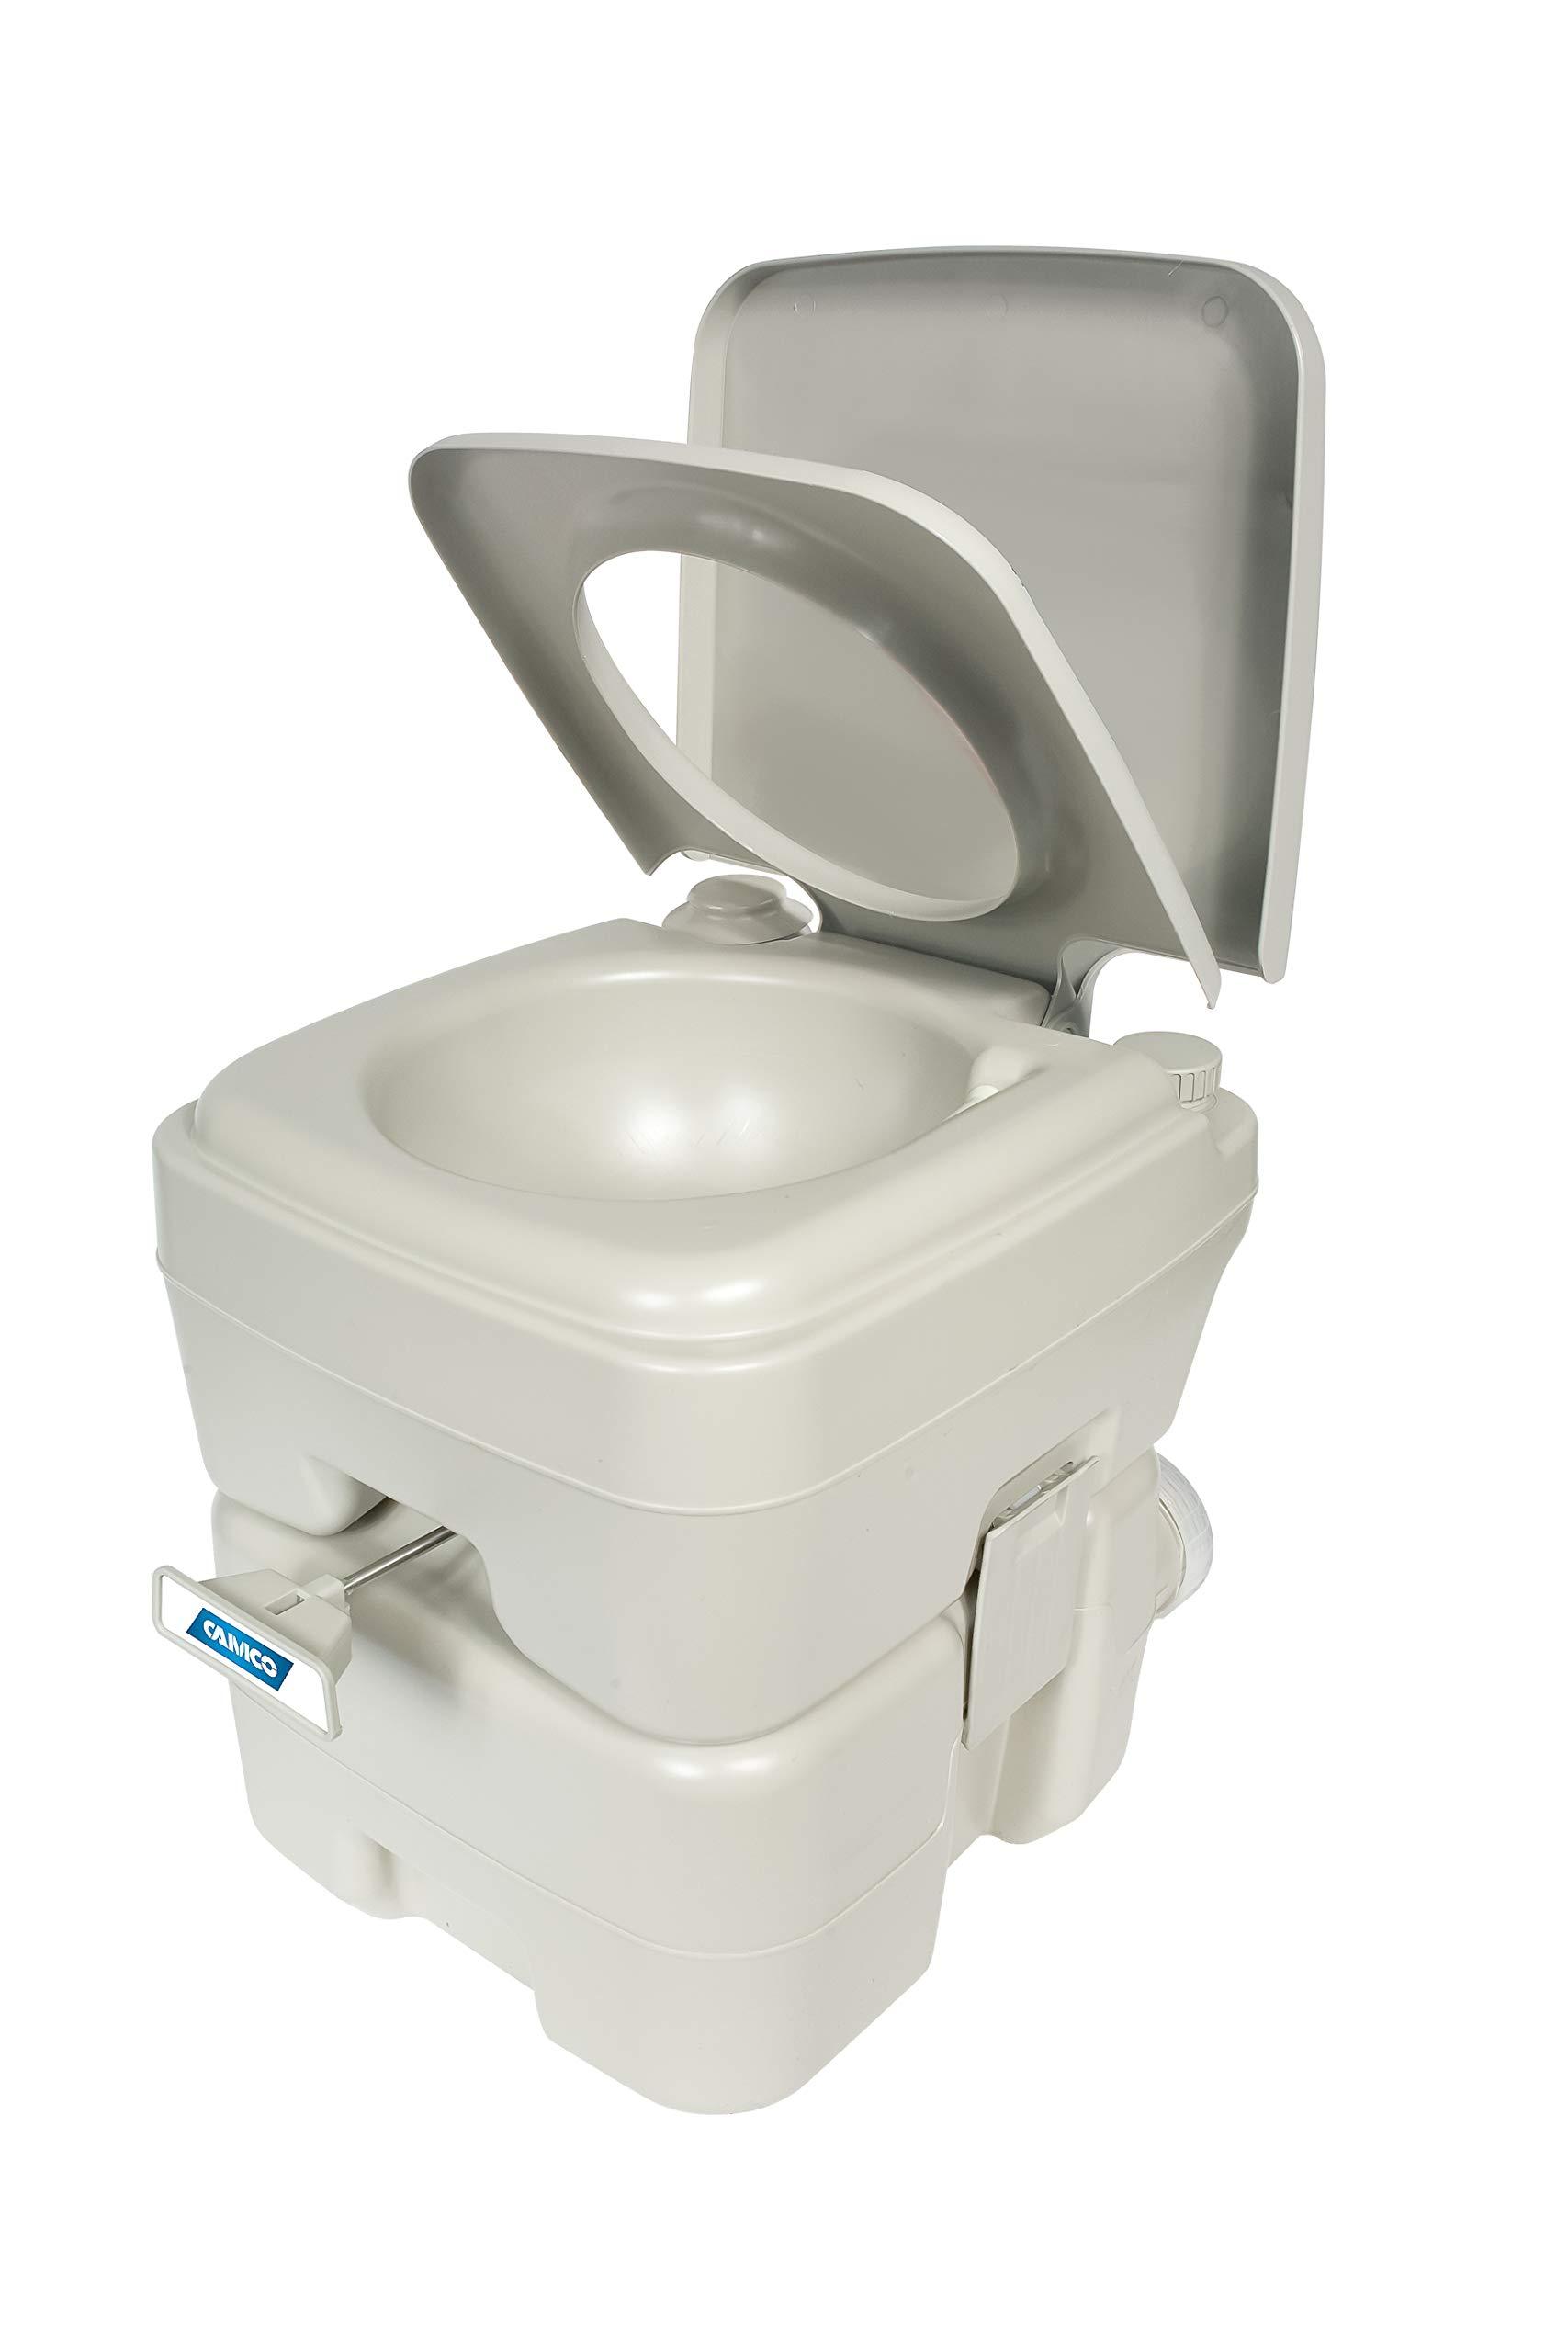 Amazon.com: Camco Standard Portable Travel Toilet, Designed for ...